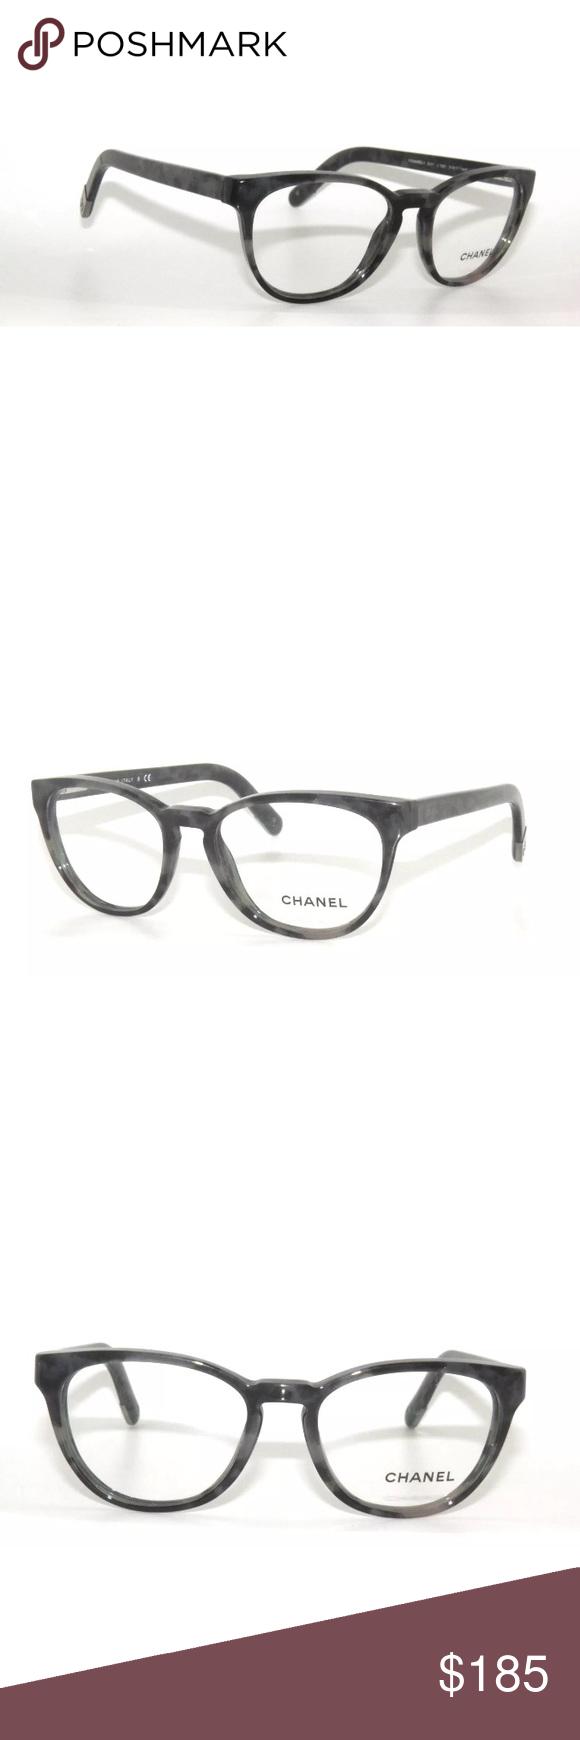 33fe592511d8 Chanel Eyeglasses 3237 grey Frame 51mm Excellent Condition